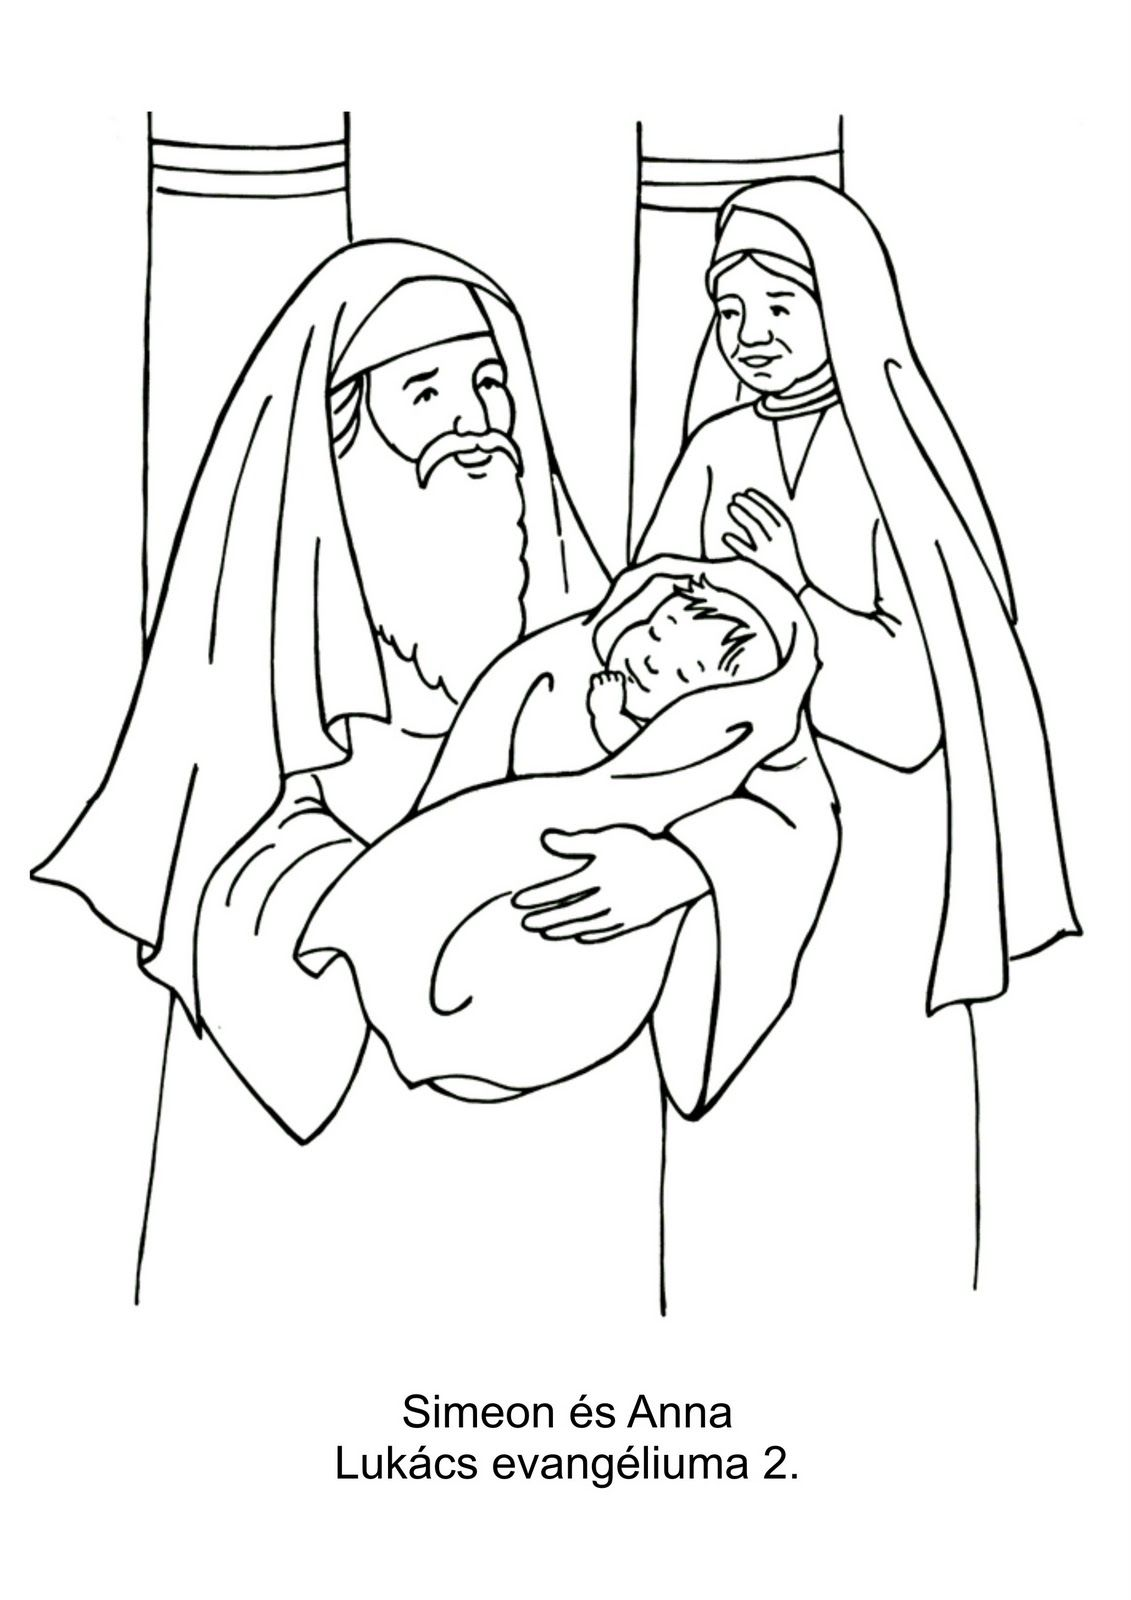 1 Samuel Eli And Boy Hannah Coloring Page